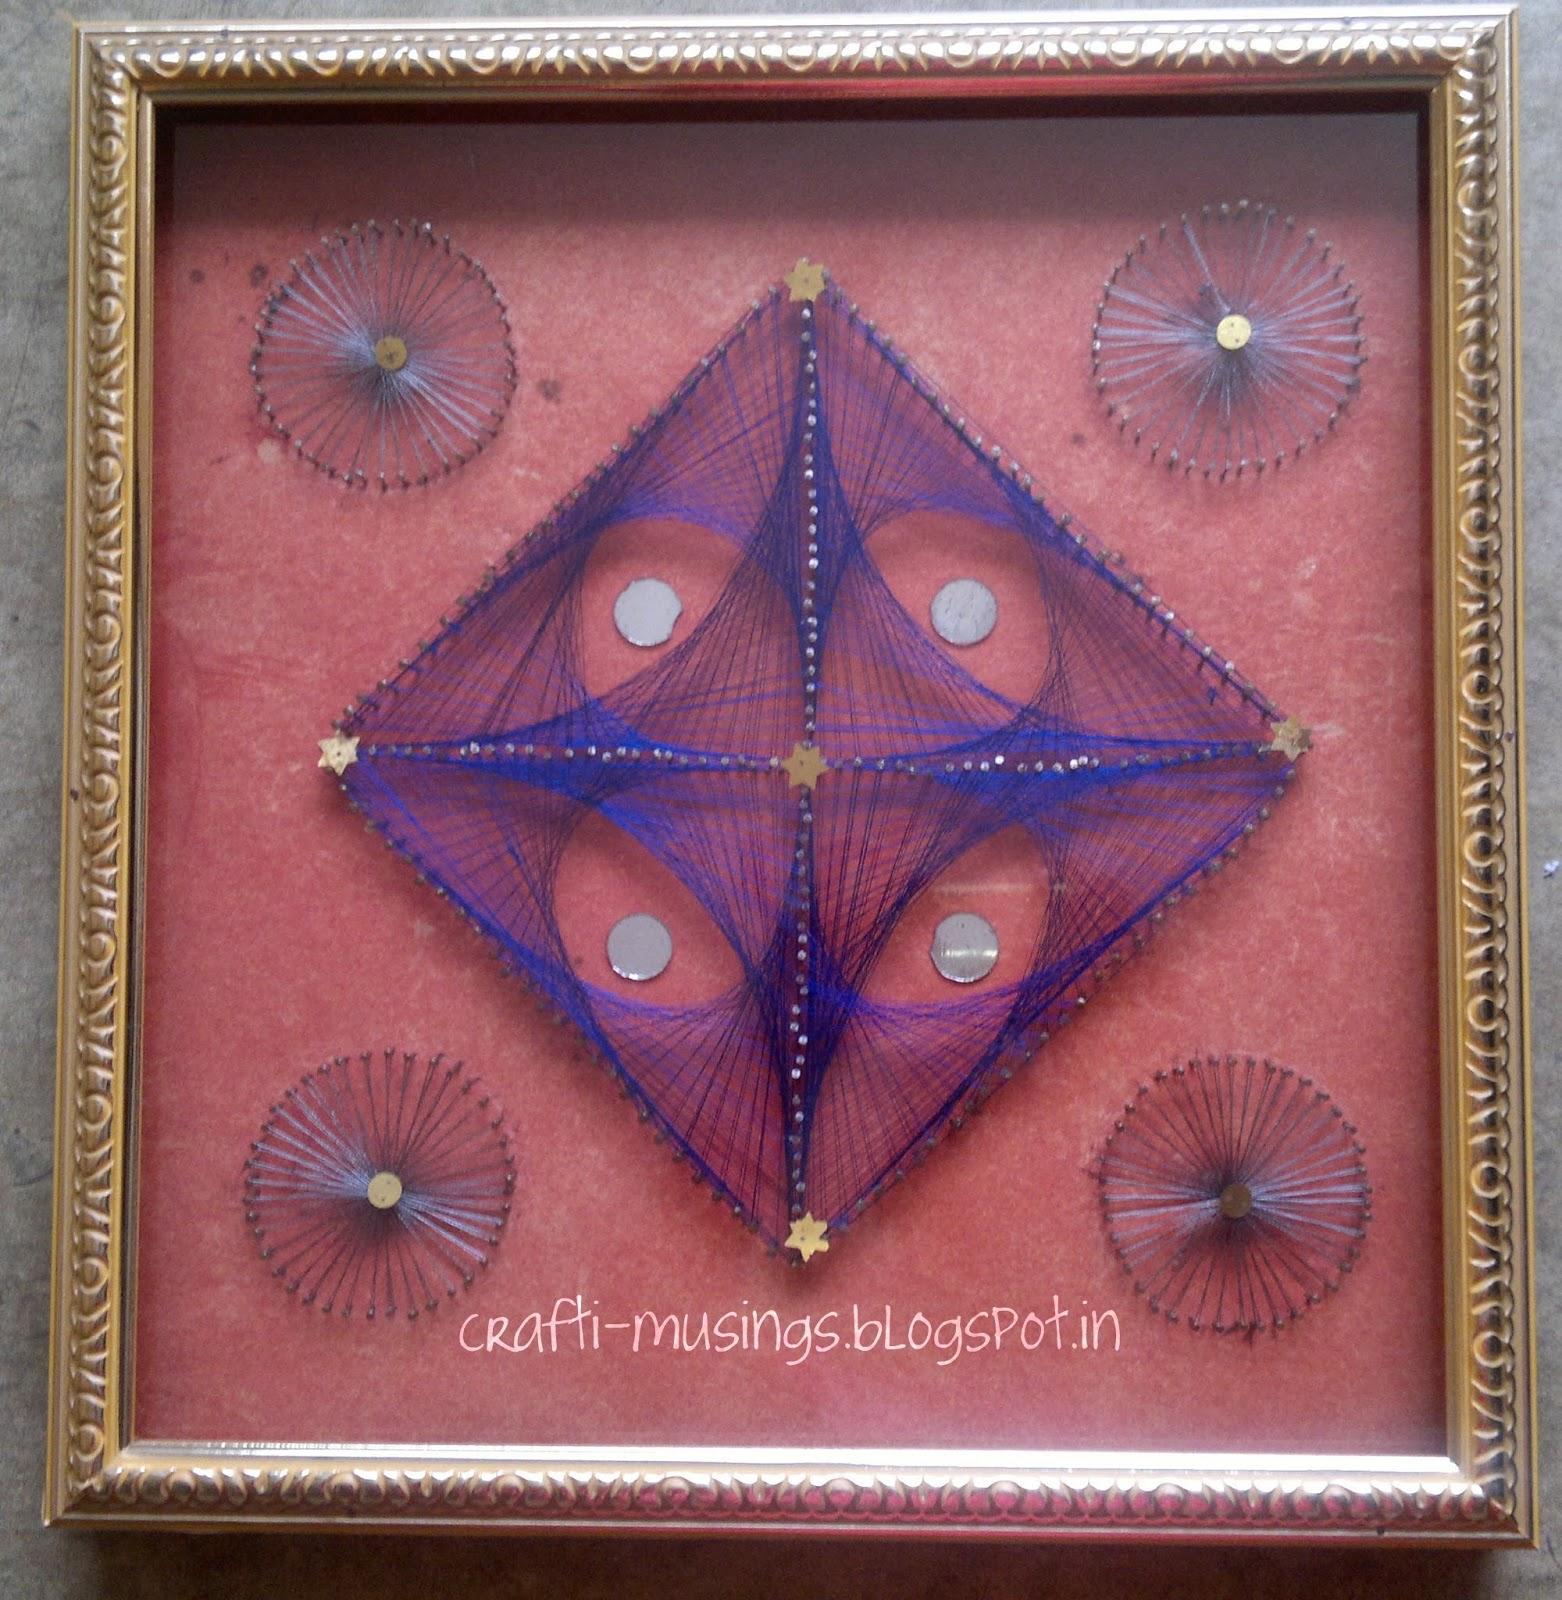 Crafti Musings String Art Treasures